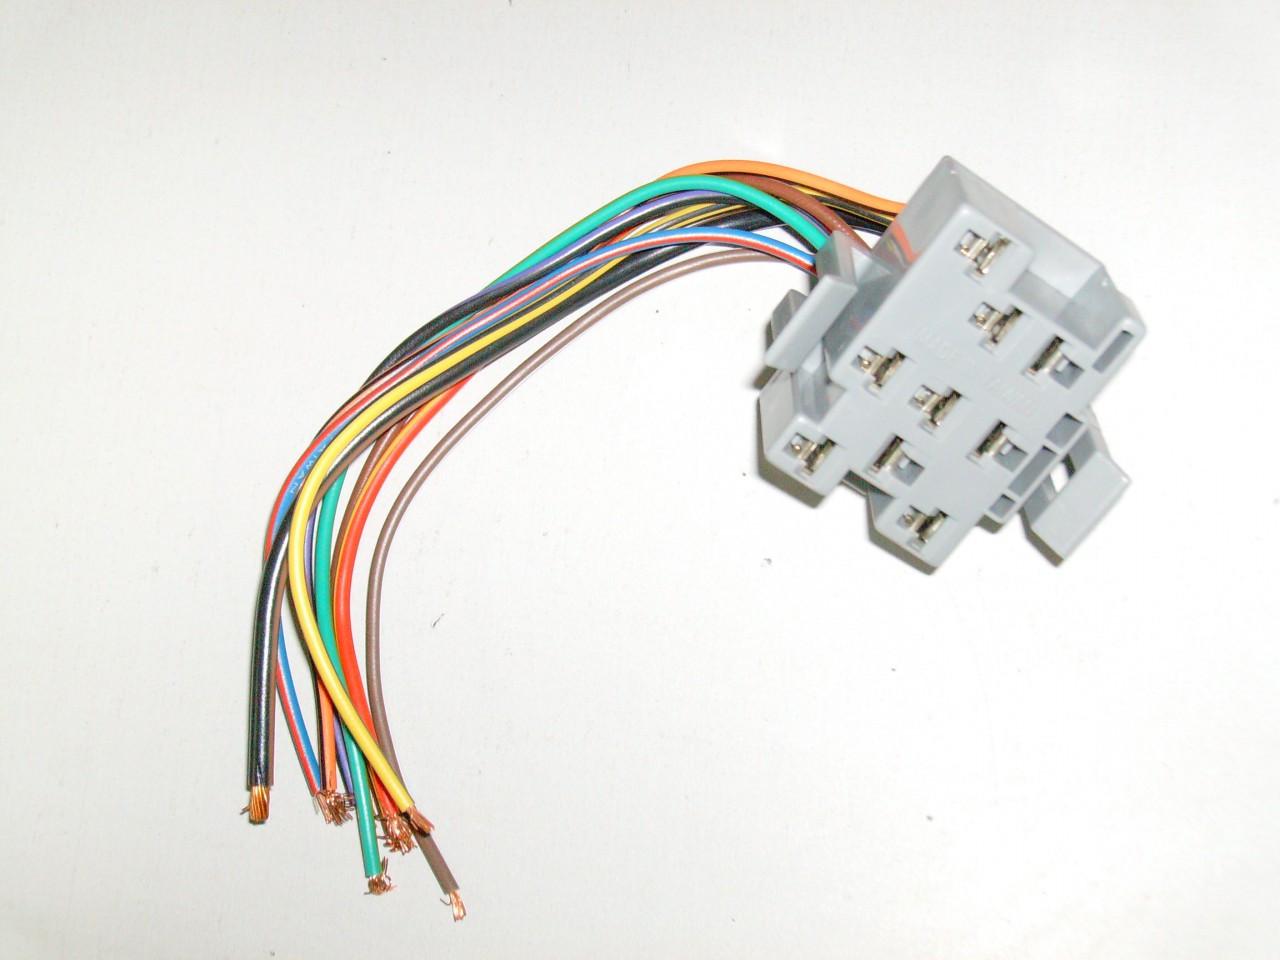 medium resolution of 1994 1998 ford mustang headlight switch plug wire harness socket gt lx cobra price 25 98 image 1